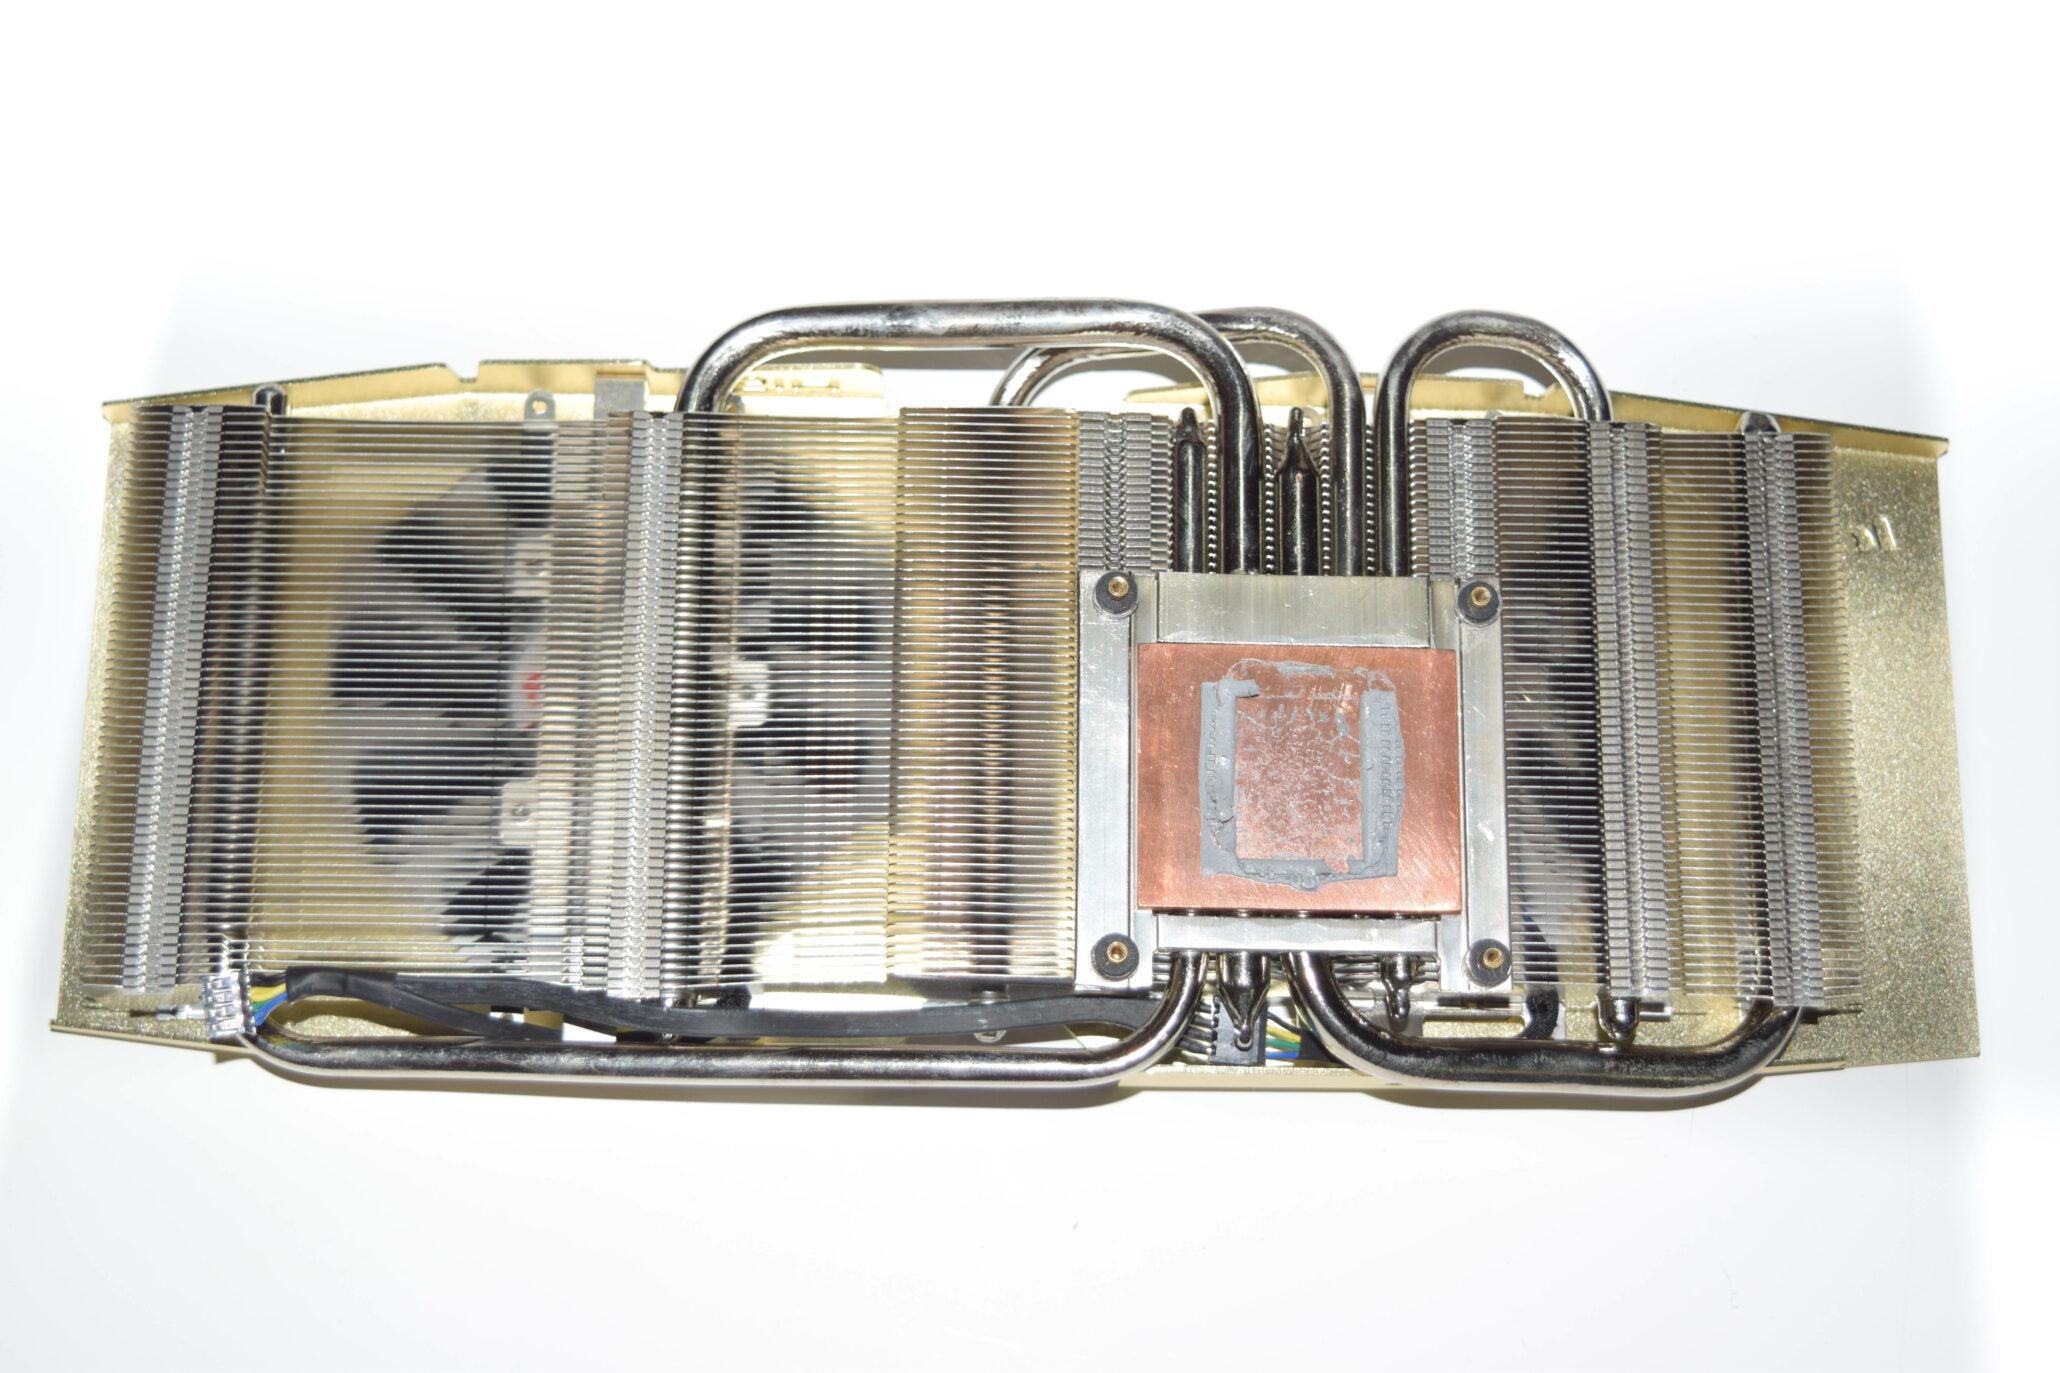 his-radeon-r9-390-iceq-x2_heatsink-1